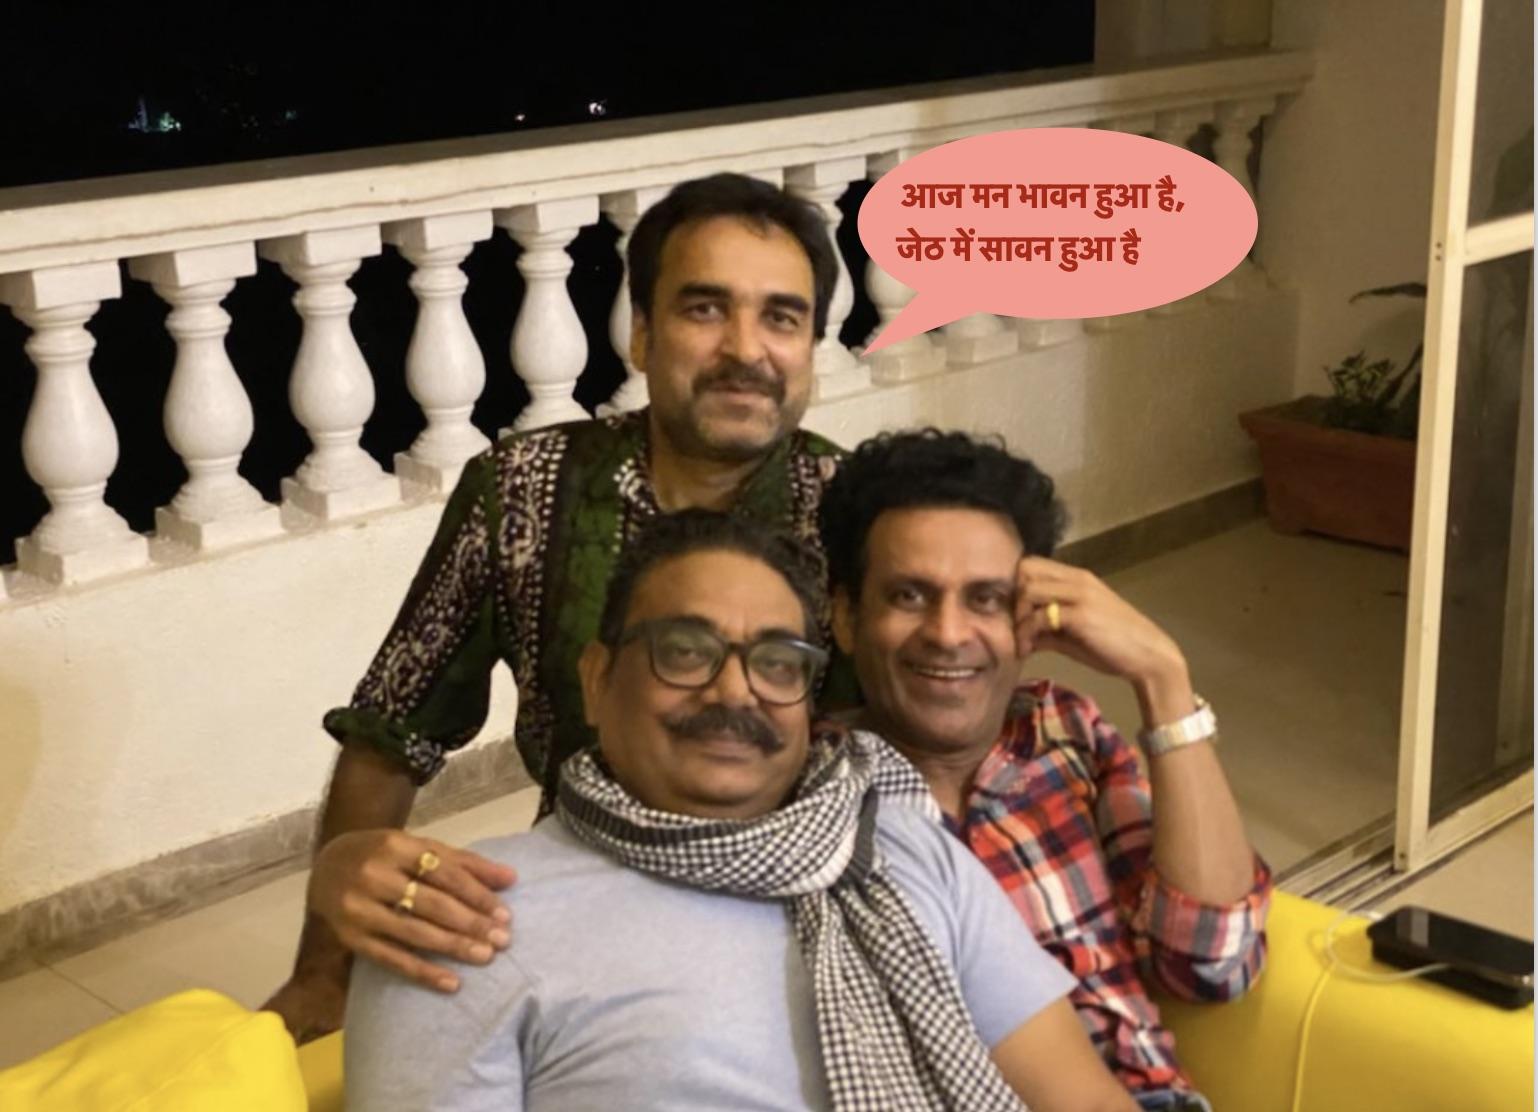 Pankaj Tripathi plays perfect host to Manoj Bajpayee, Vineet Kumar